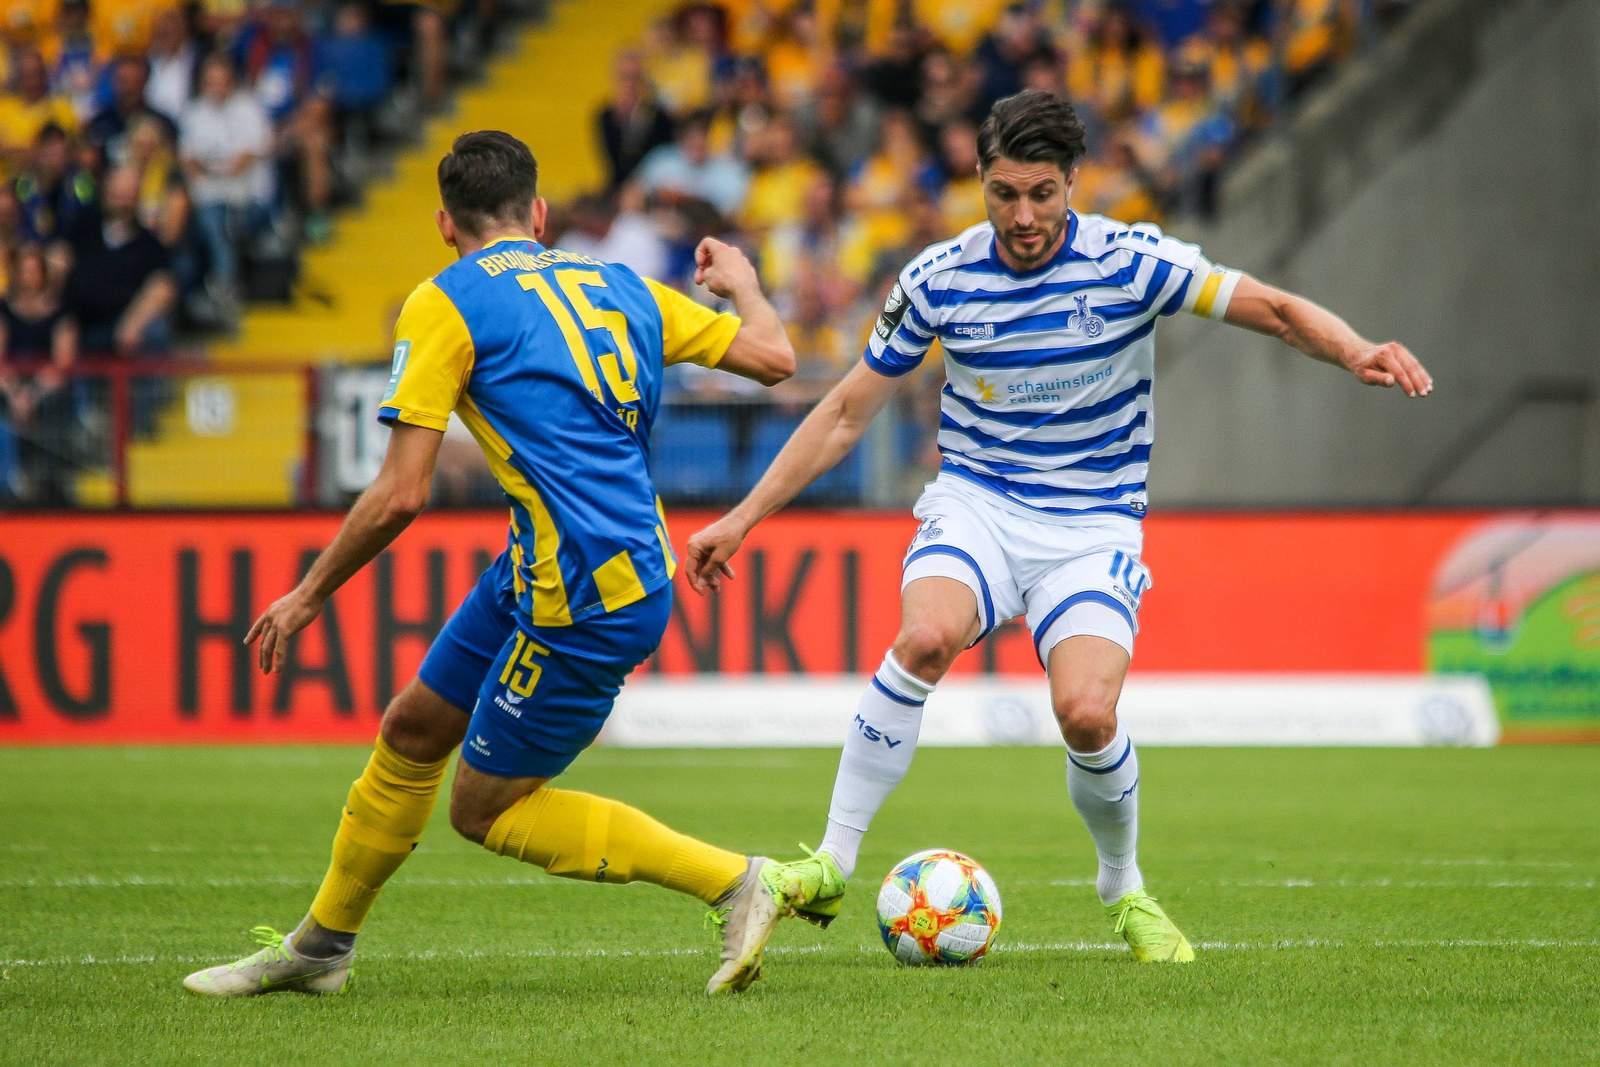 Marcel Bär von Braunschweig (l.) gegen Duisburgs Moritz Stoppelkamp.